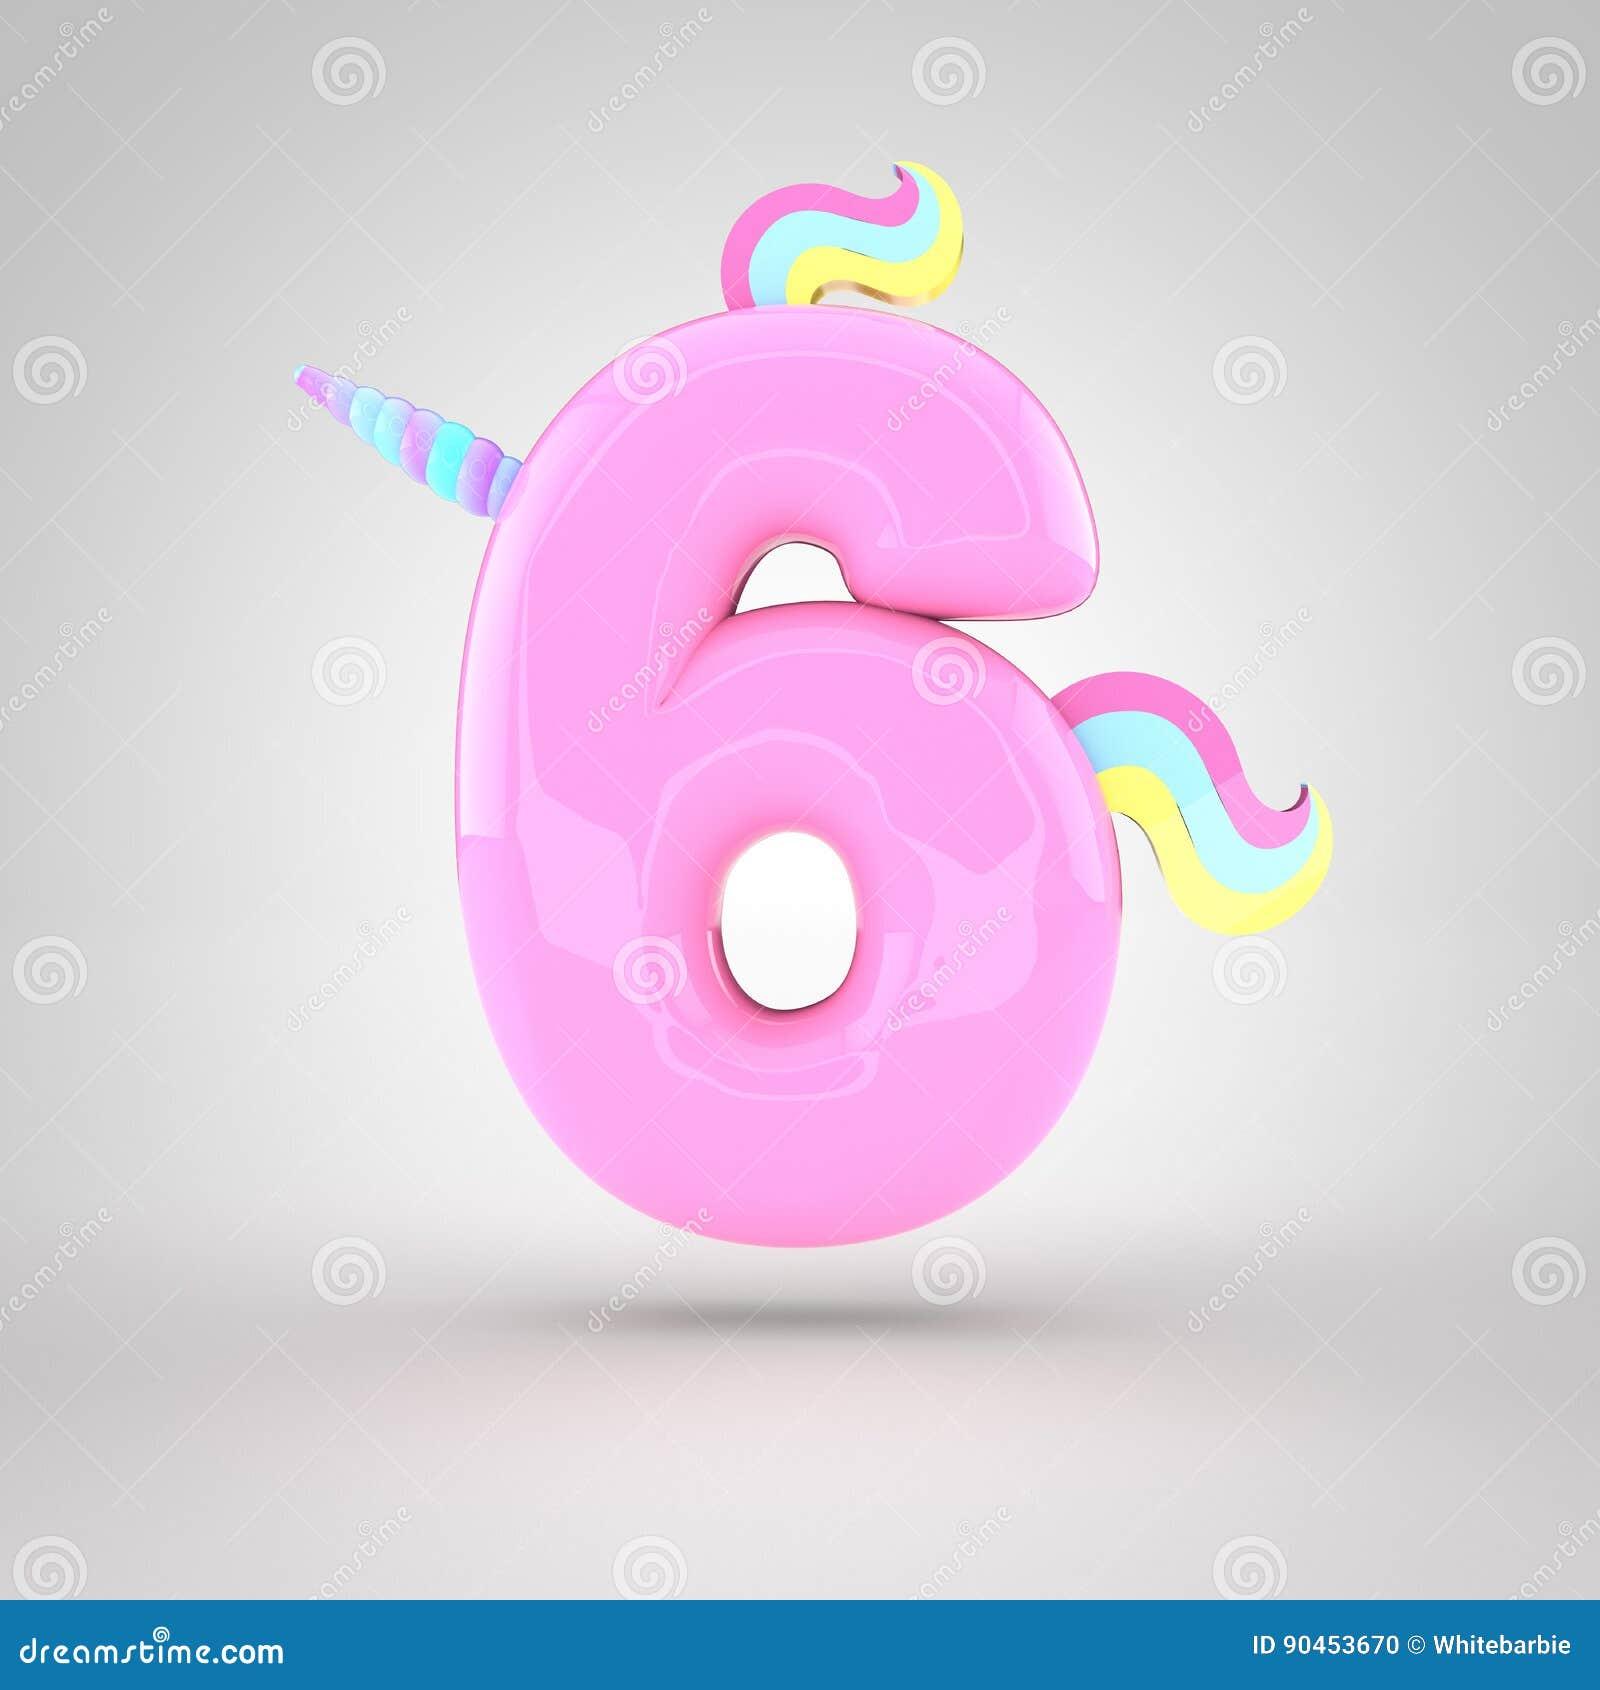 Cute unicorn pink number 5 stock illustration. Illustration of horn ...